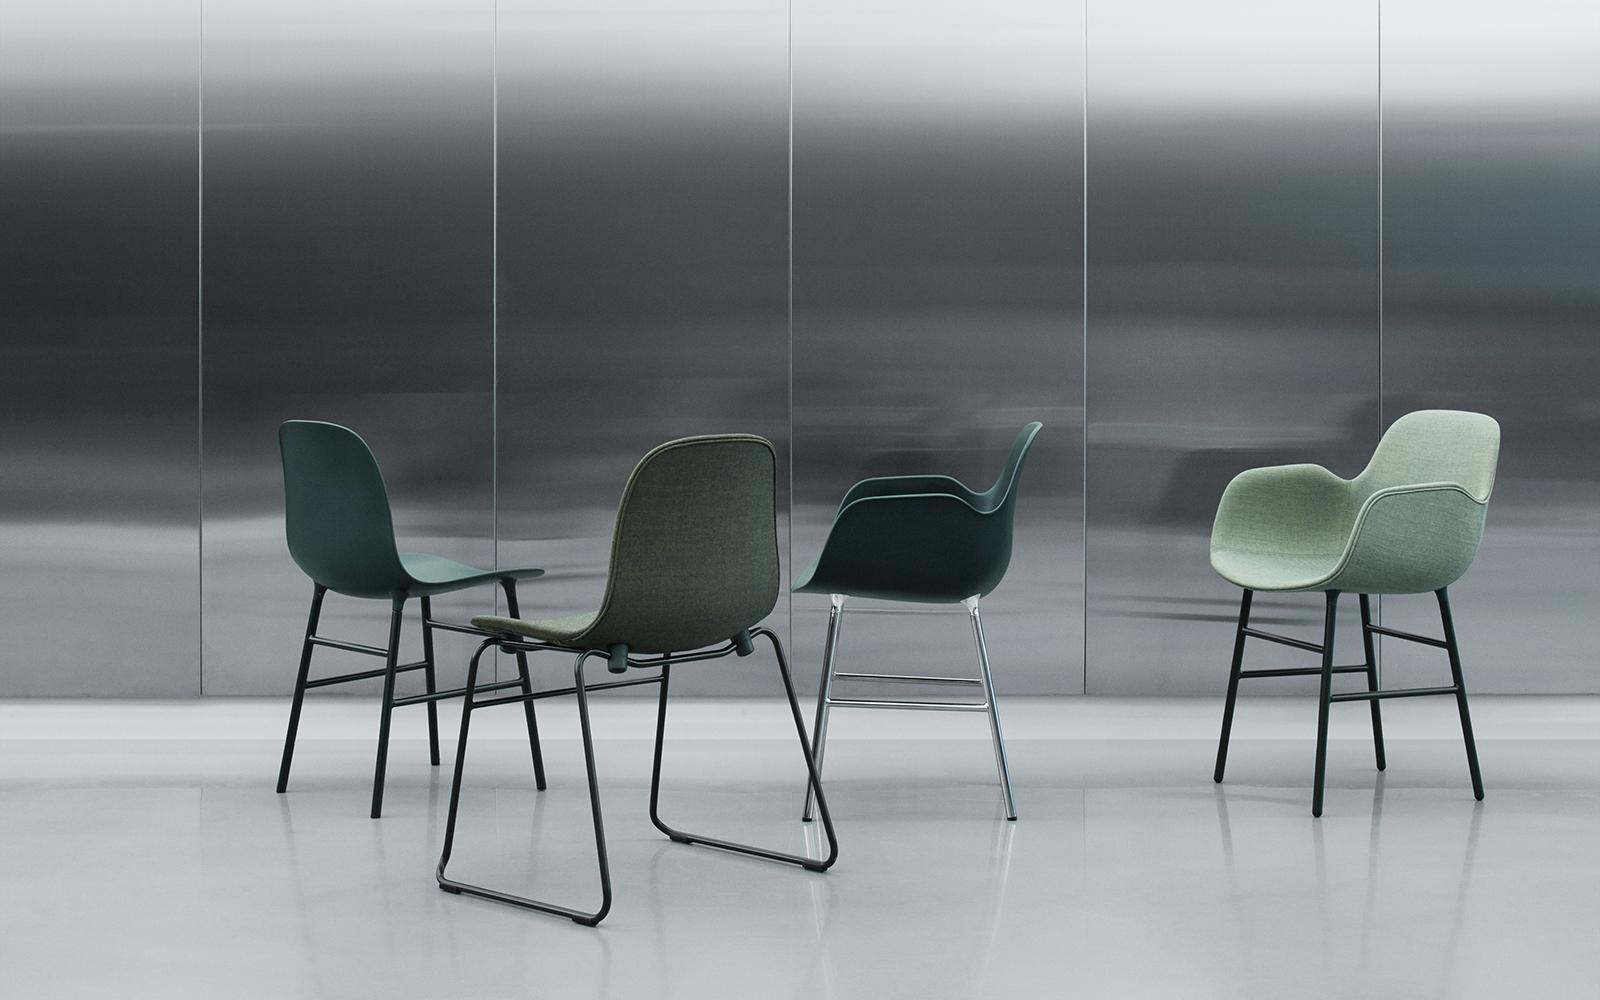 Superb Customize Form Chair Full Upholstery Creativecarmelina Interior Chair Design Creativecarmelinacom